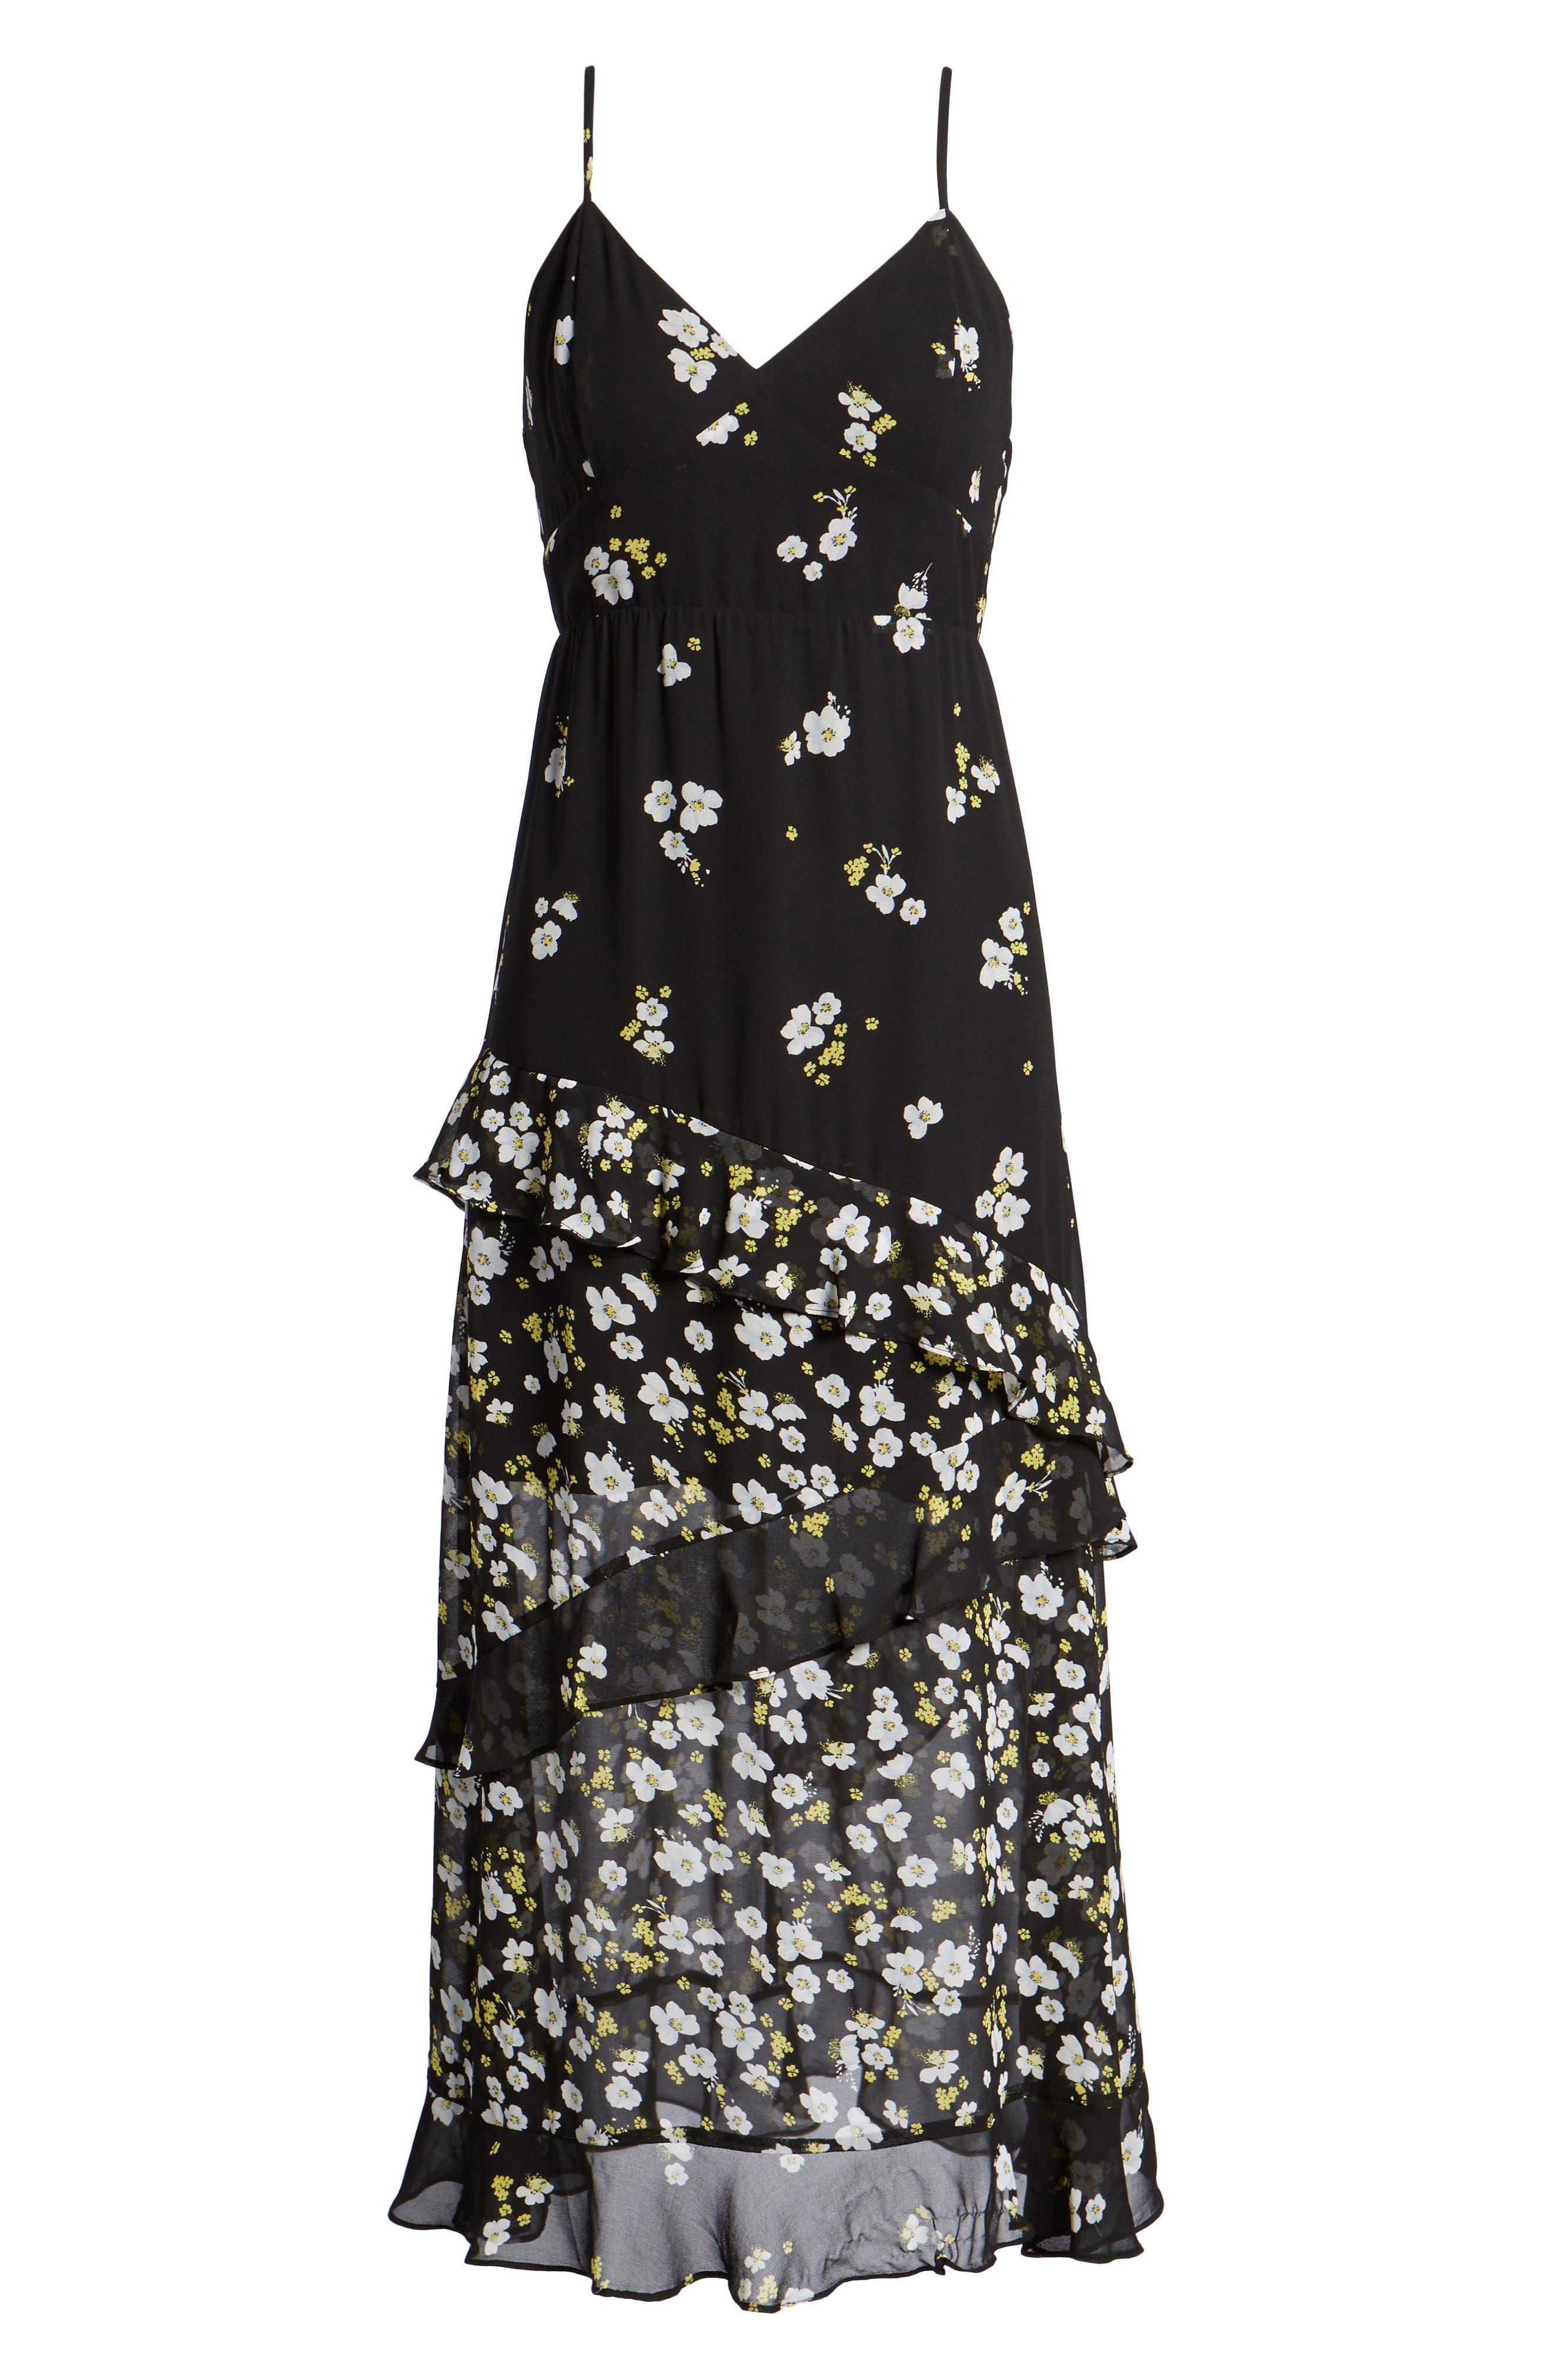 Ditzy Floral & Ruffle Chiffon Dress,                             Alternate thumbnail 7, color,                             001